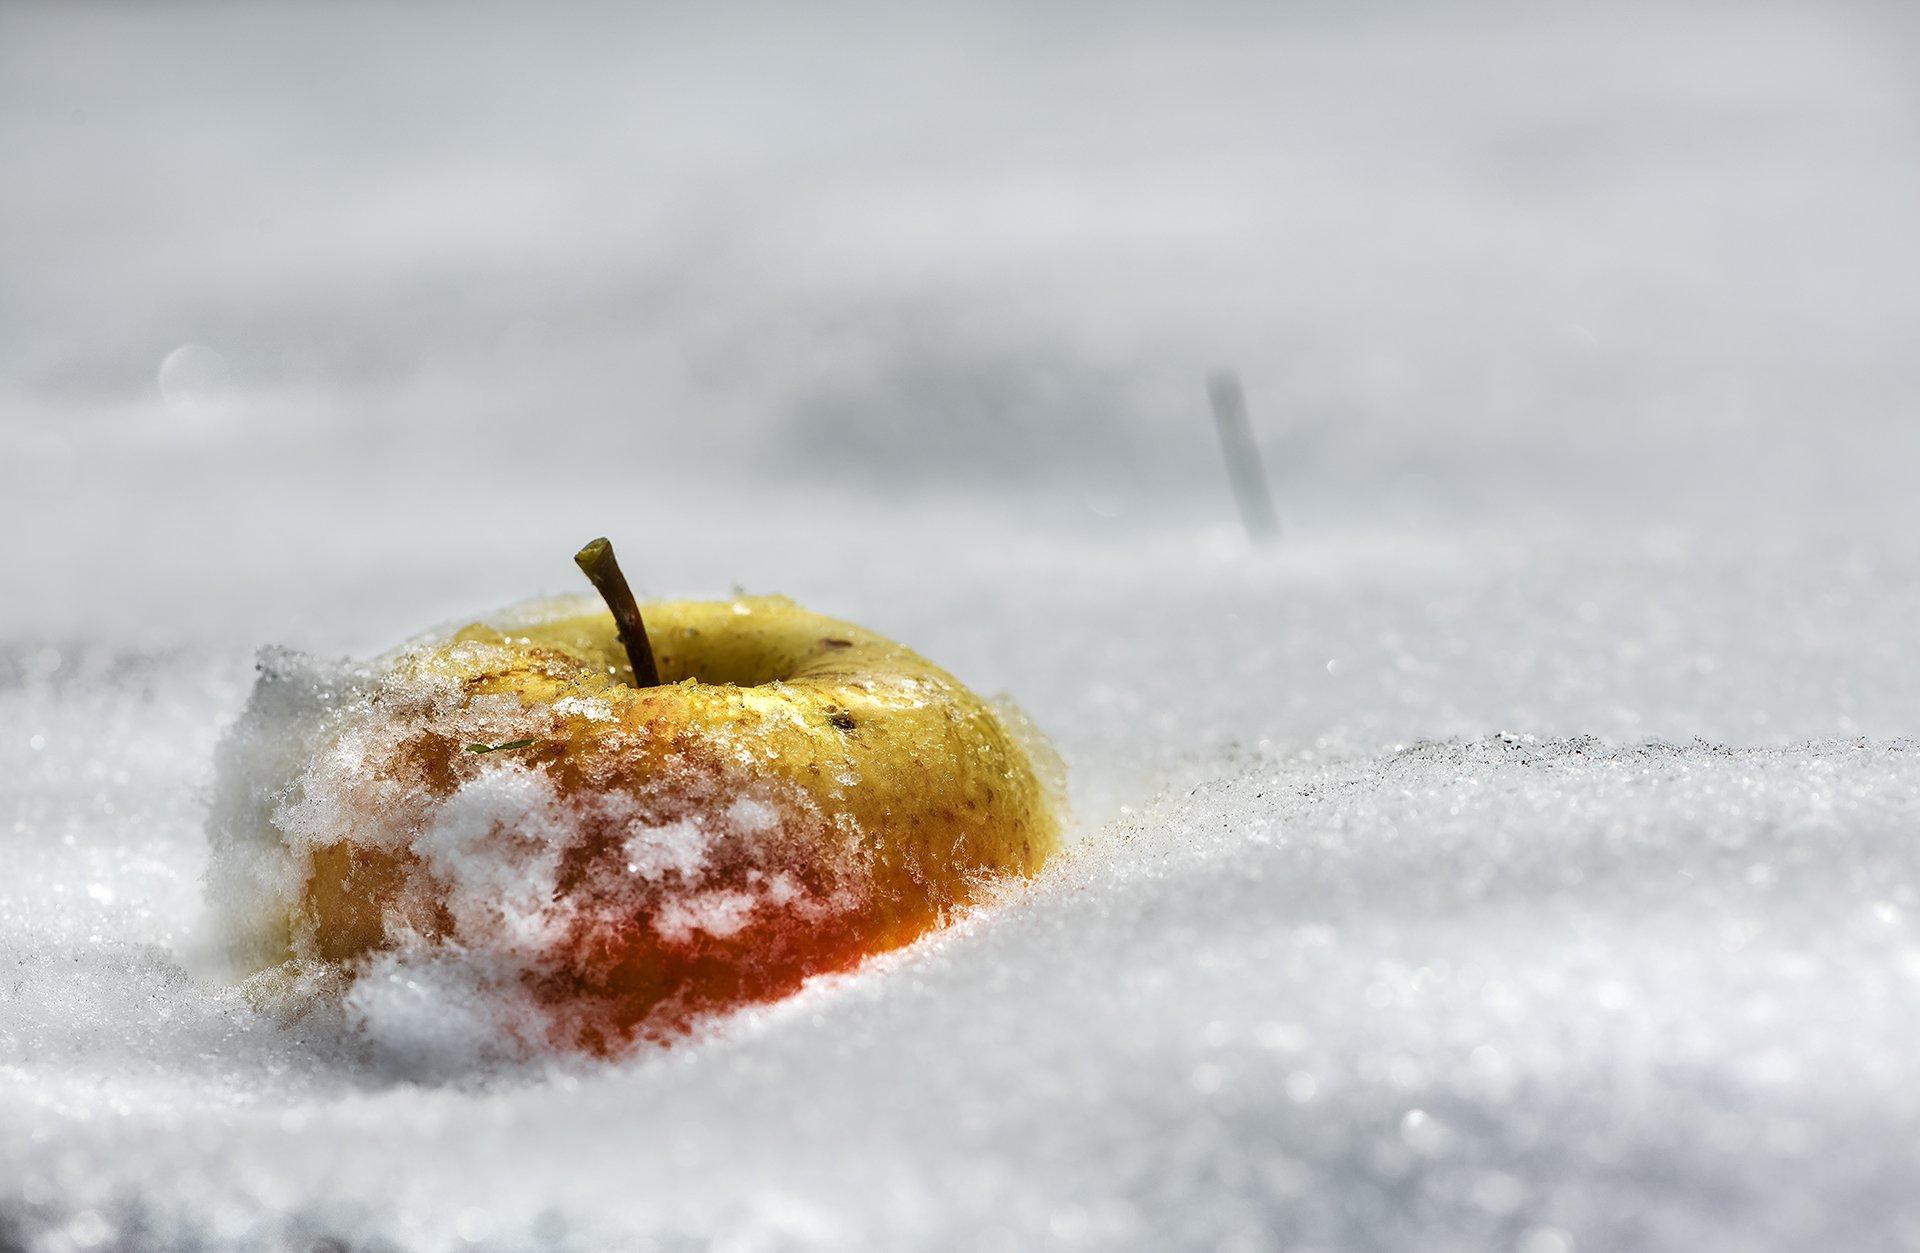 природа, макро, снег, яблоко, Неля Рачкова